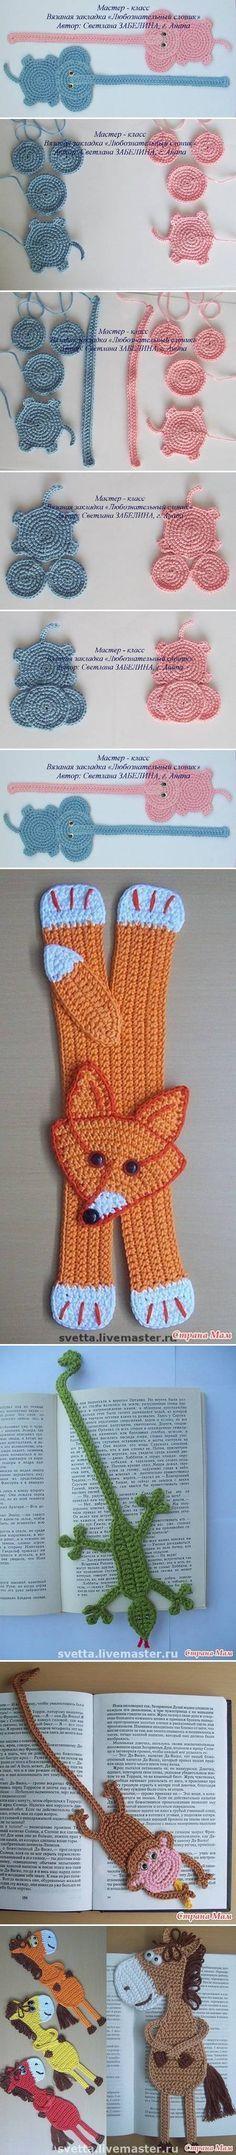 DIY Crochet Elephant Bookmark DIY Projects | UsefulDIY.com ✿⊱╮Teresa Restegui http://www.pinterest.com/teretegui/✿⊱╮